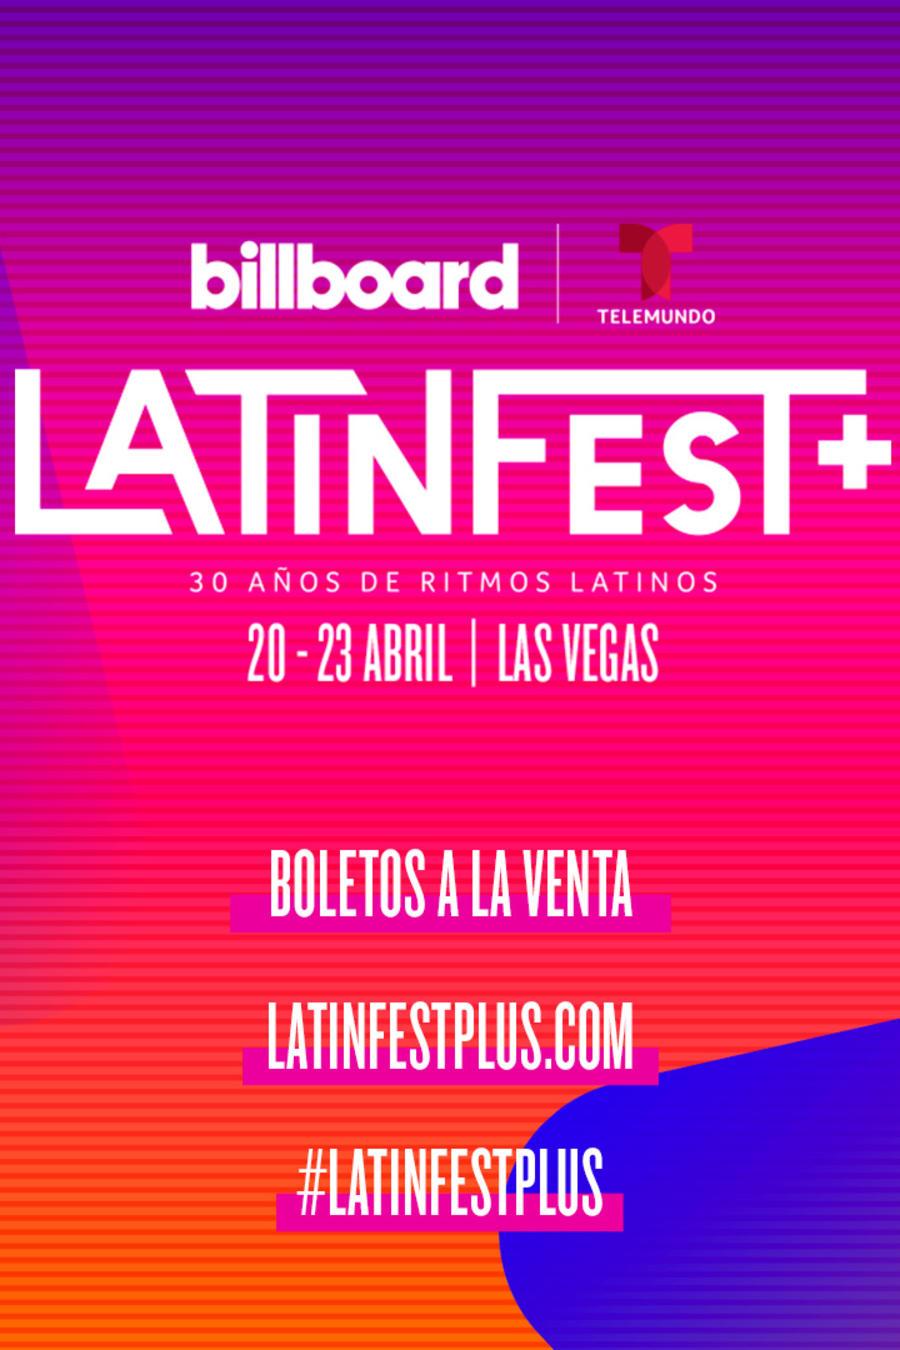 Latin Fest +